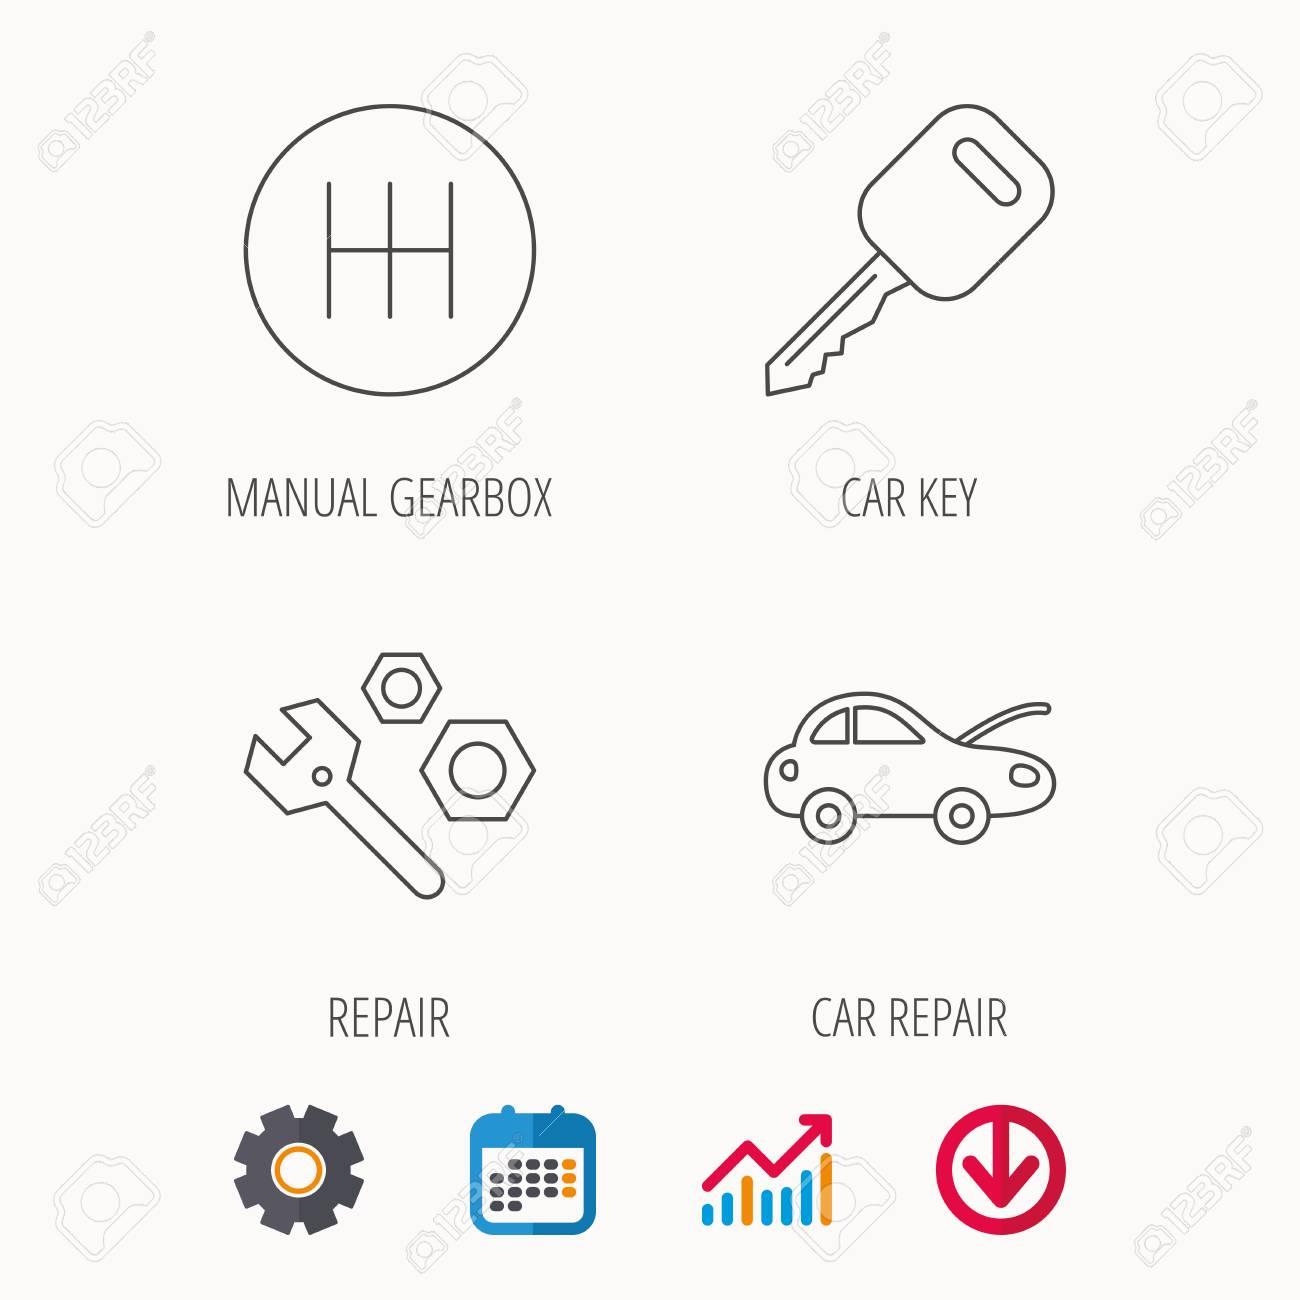 Vn Gearbox Repair Guide Ebook Roper Dryer Parts Diagram 864 X 1095 16 Kb Png Excellent Array Car Key Tools And Manual Icons Rh 123rf Com